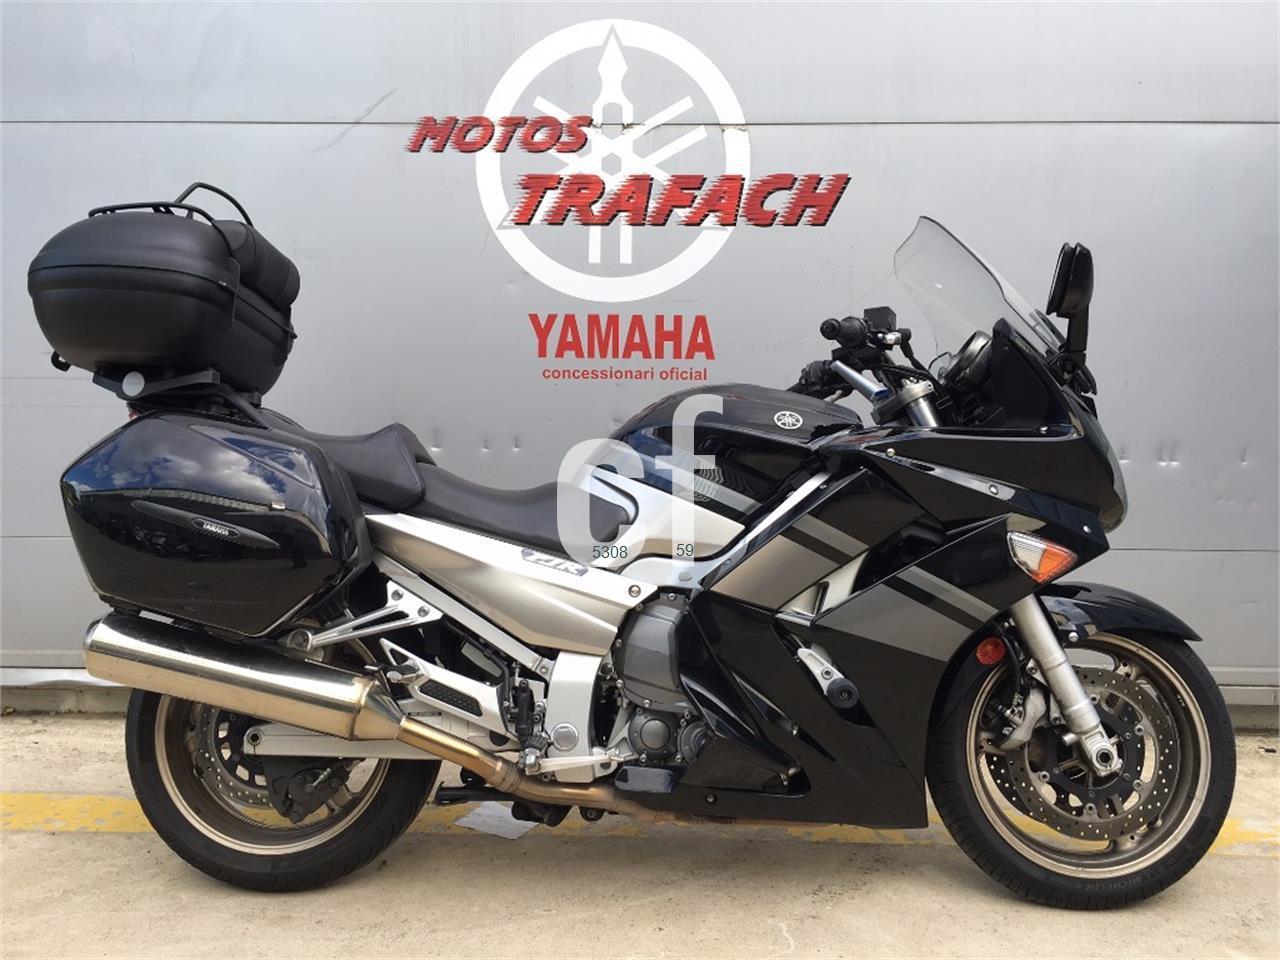 YAMAHA FJR 1300 A de venta